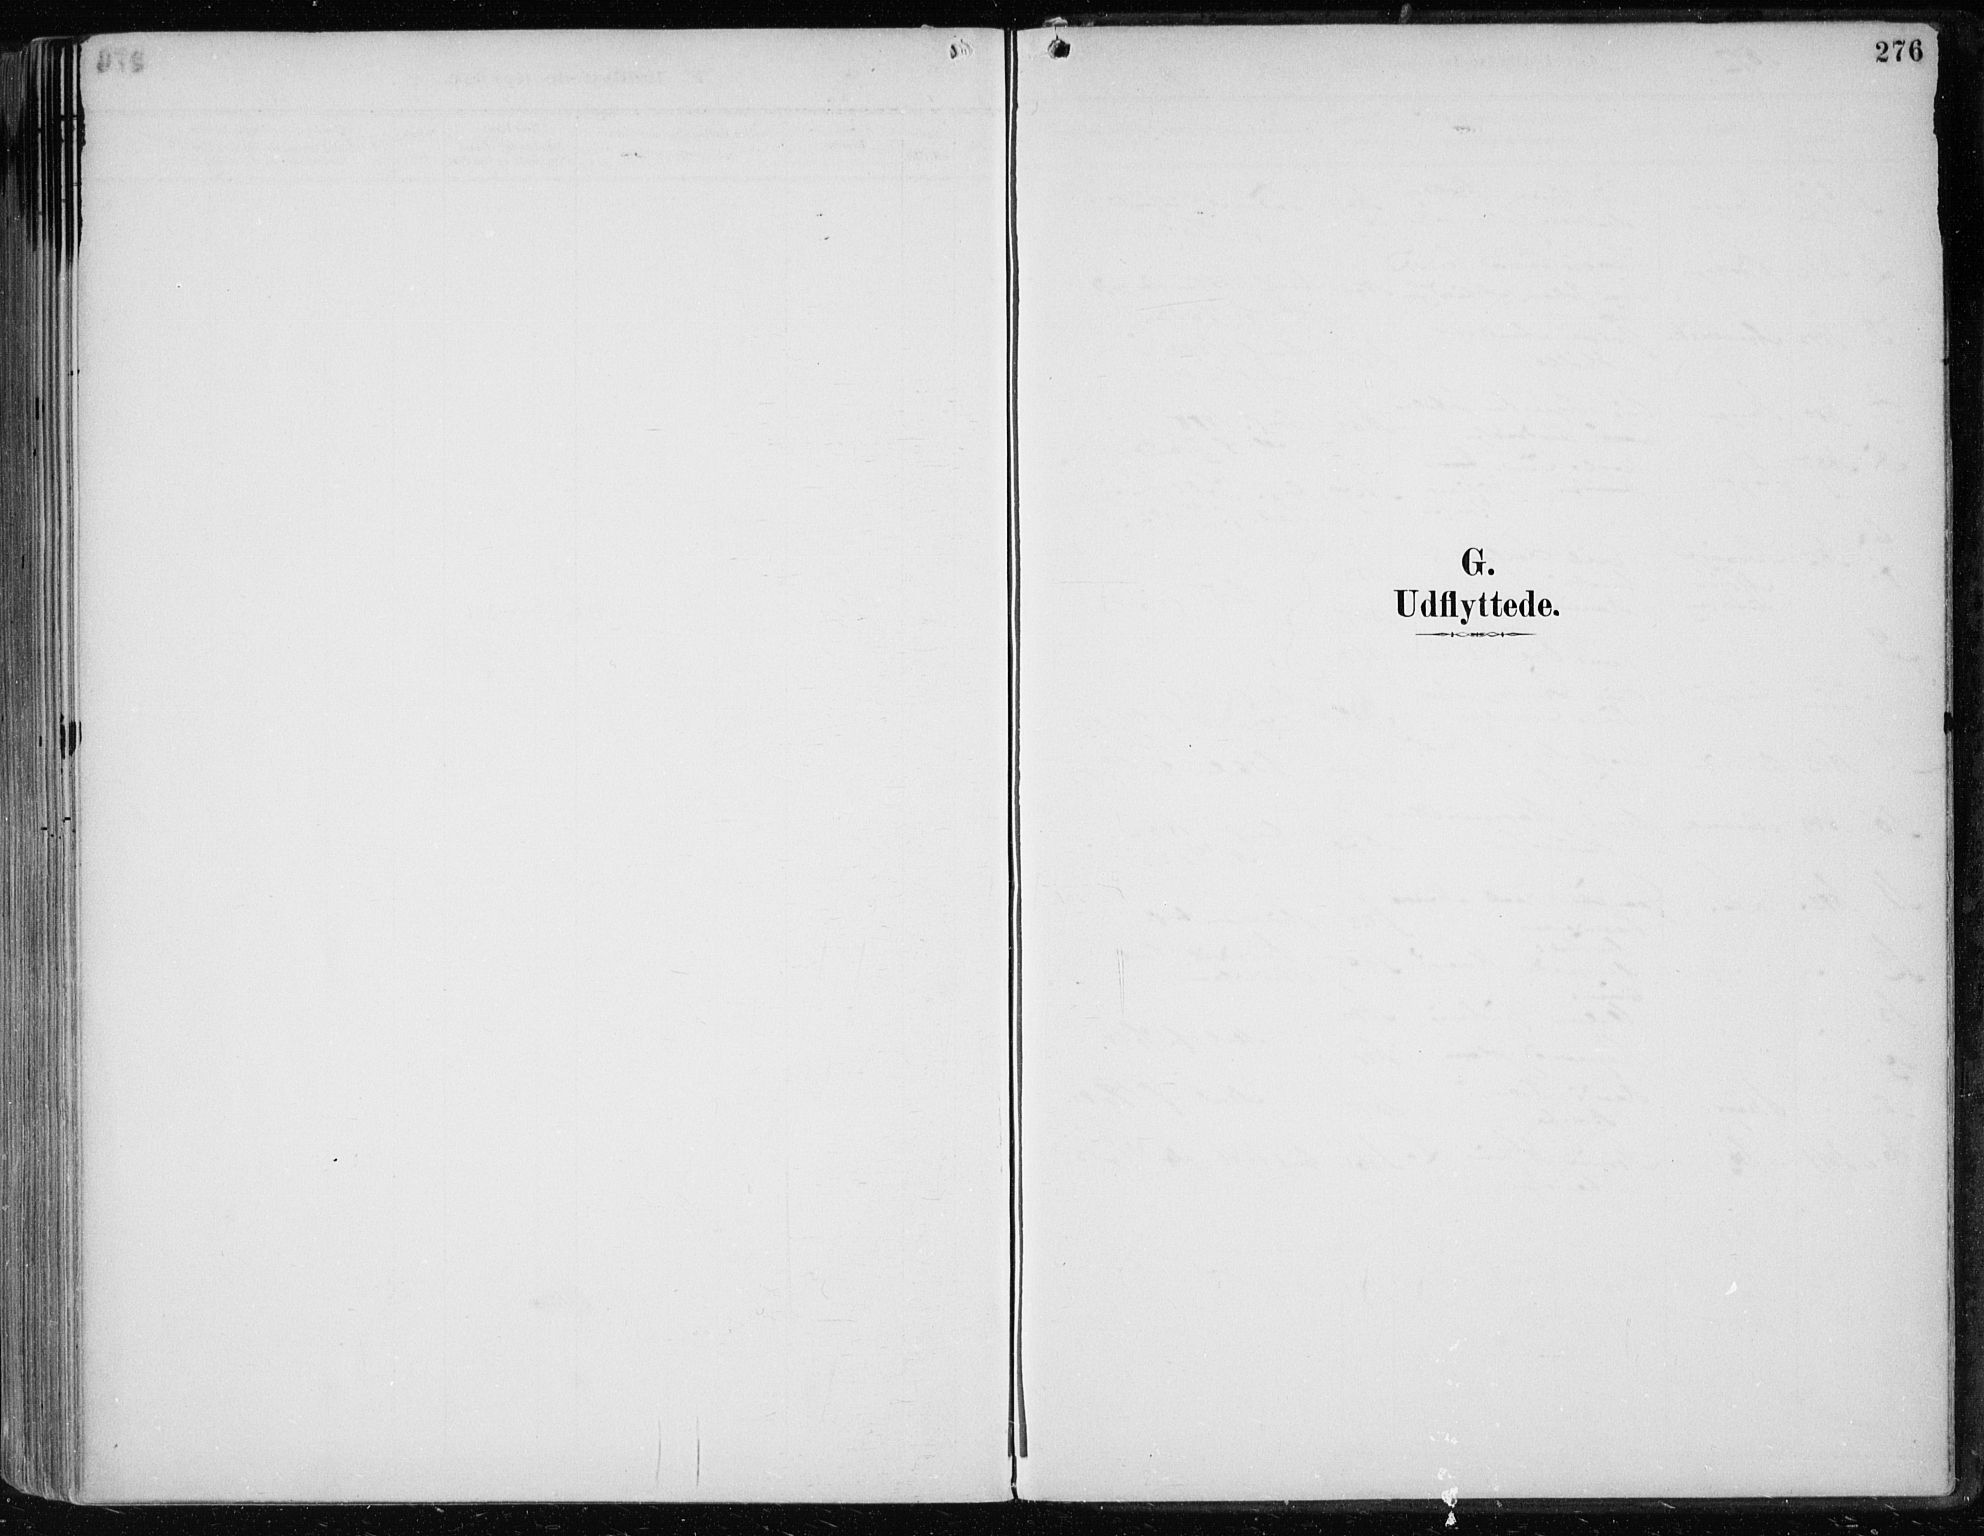 SAB, Laksevåg Sokneprestembete, H/Haa: Ministerialbok nr. A 3, 1891-1903, s. 276